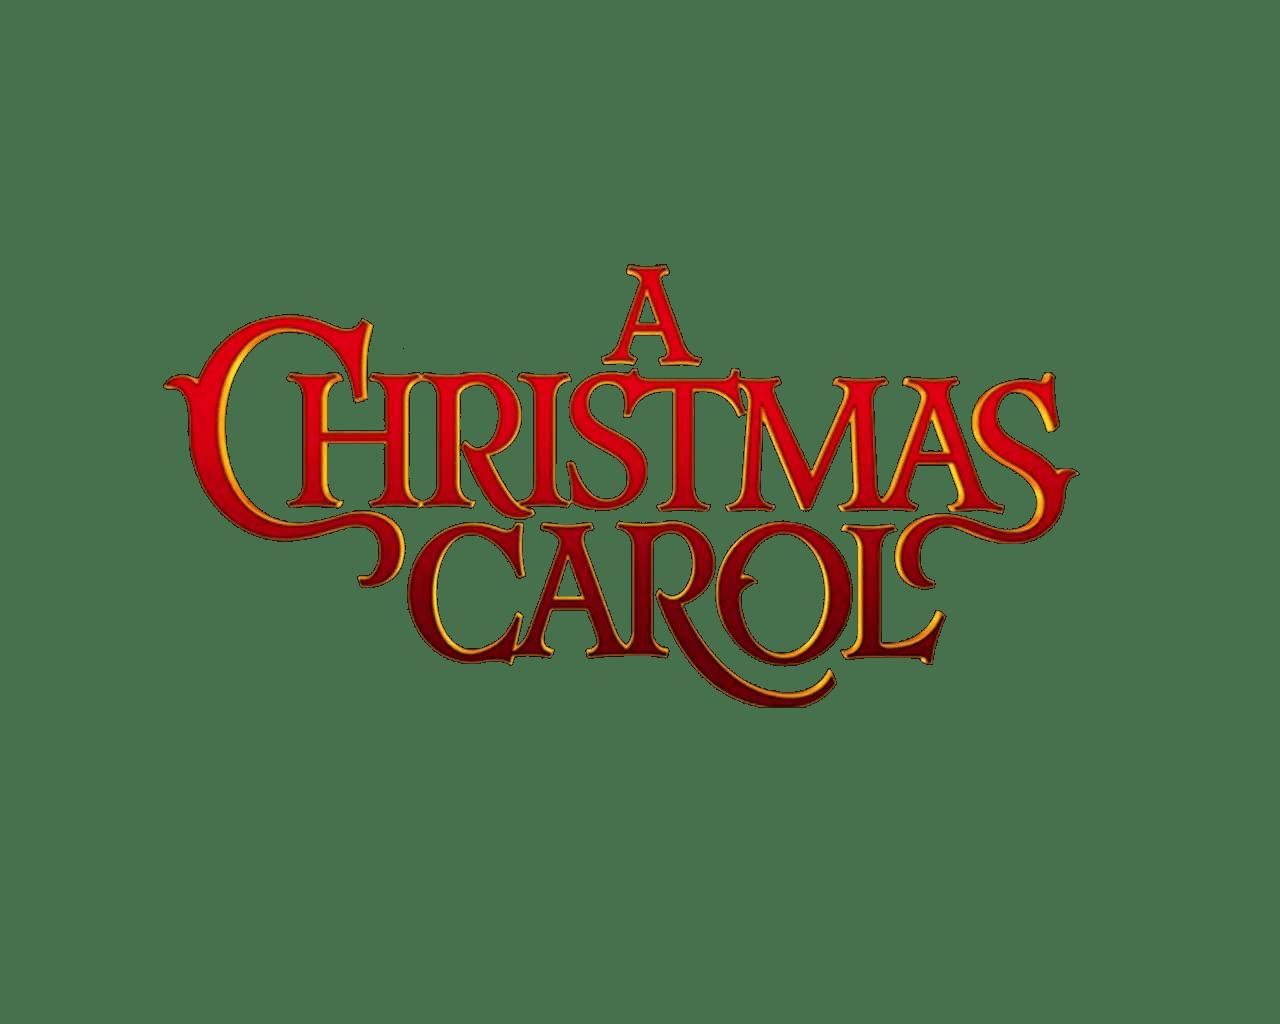 logo clipart christmas